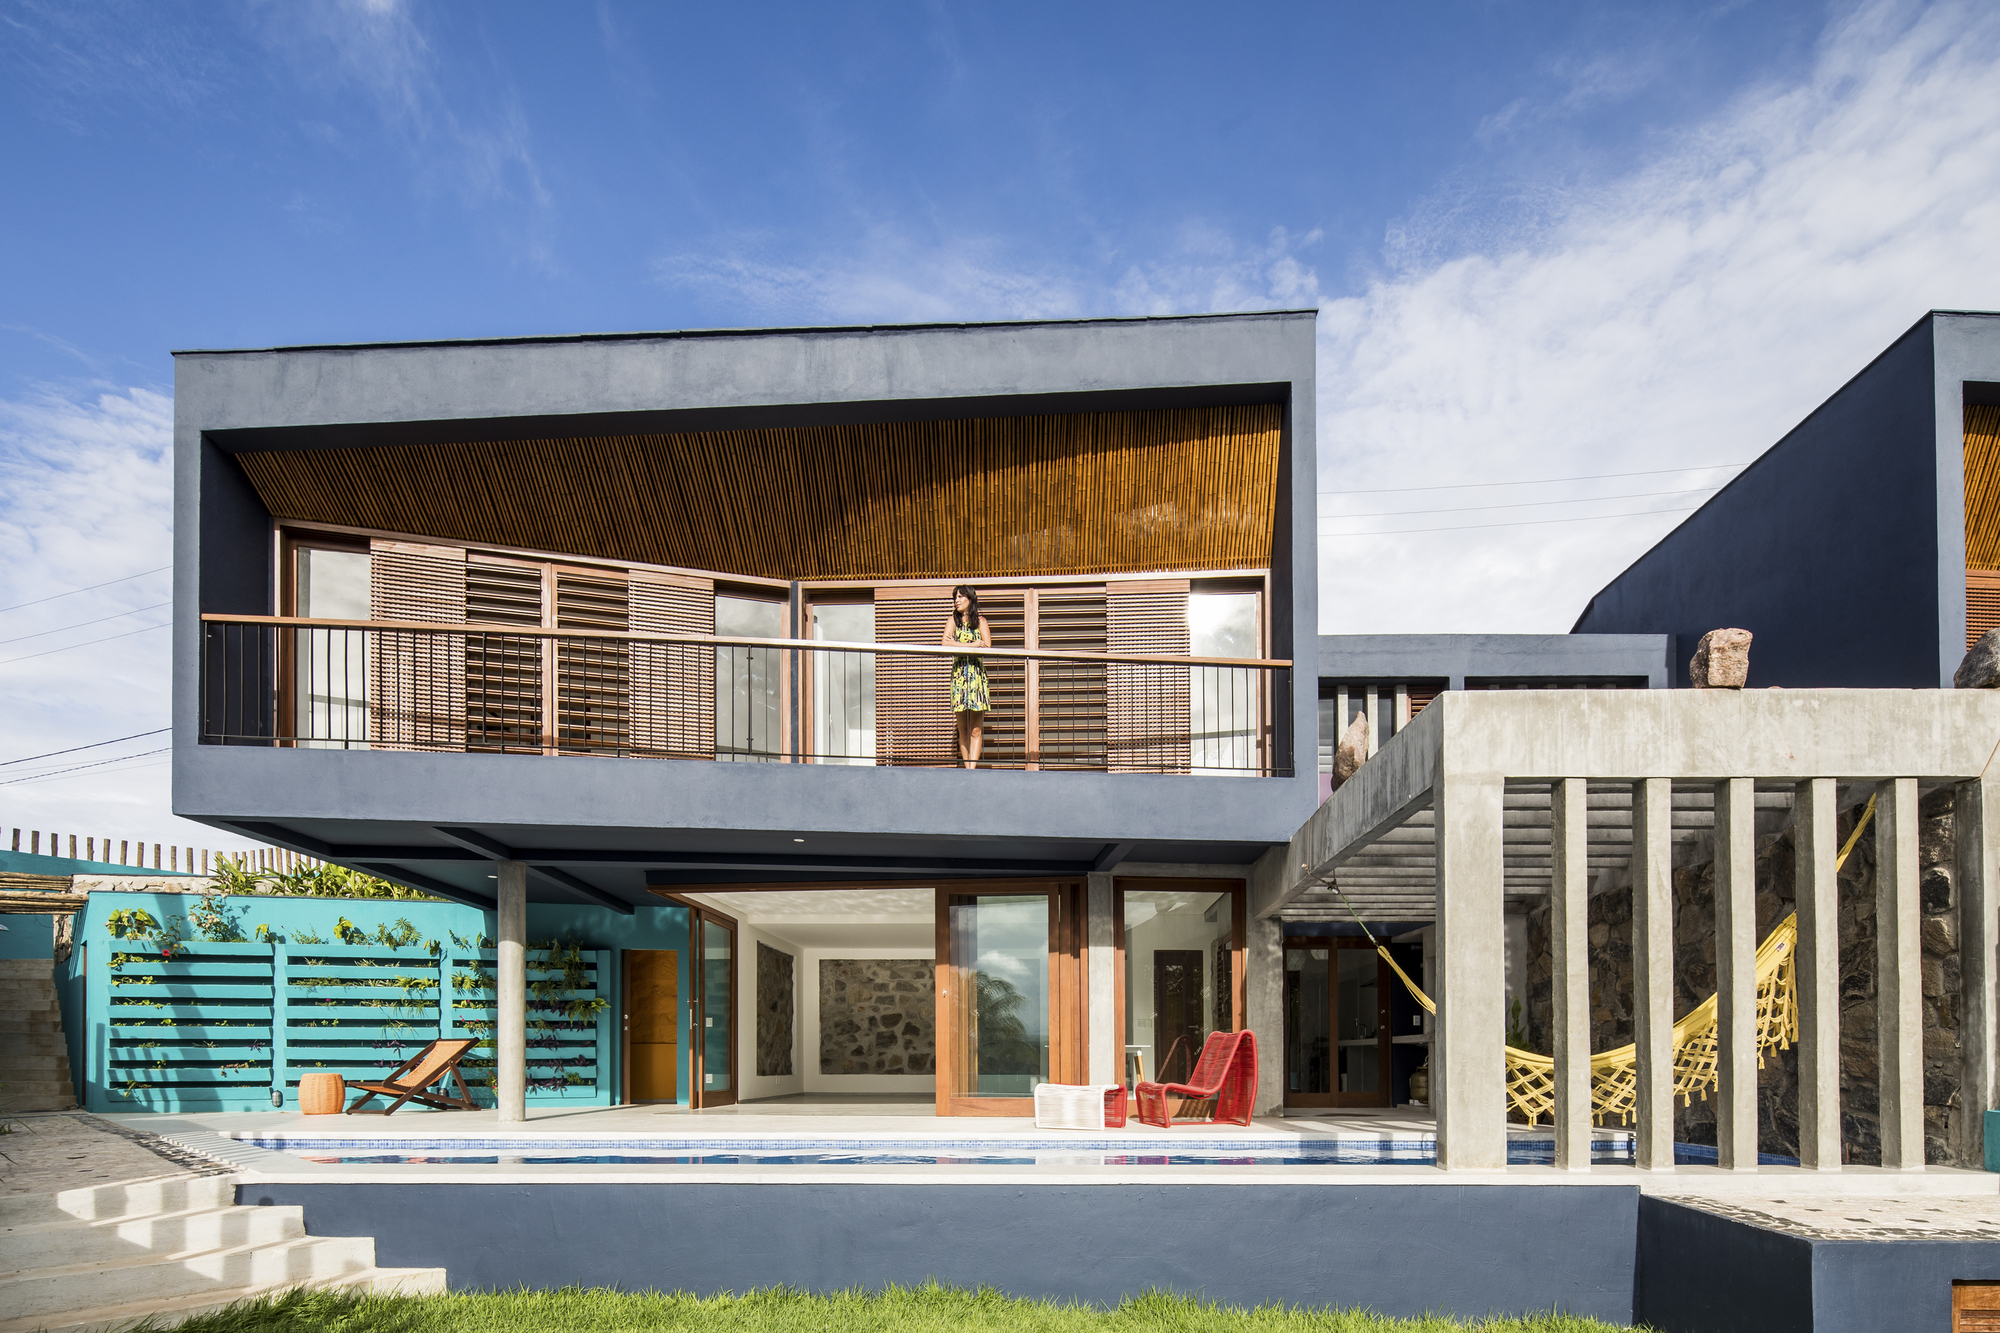 Sunset Houses / Vilela Florez